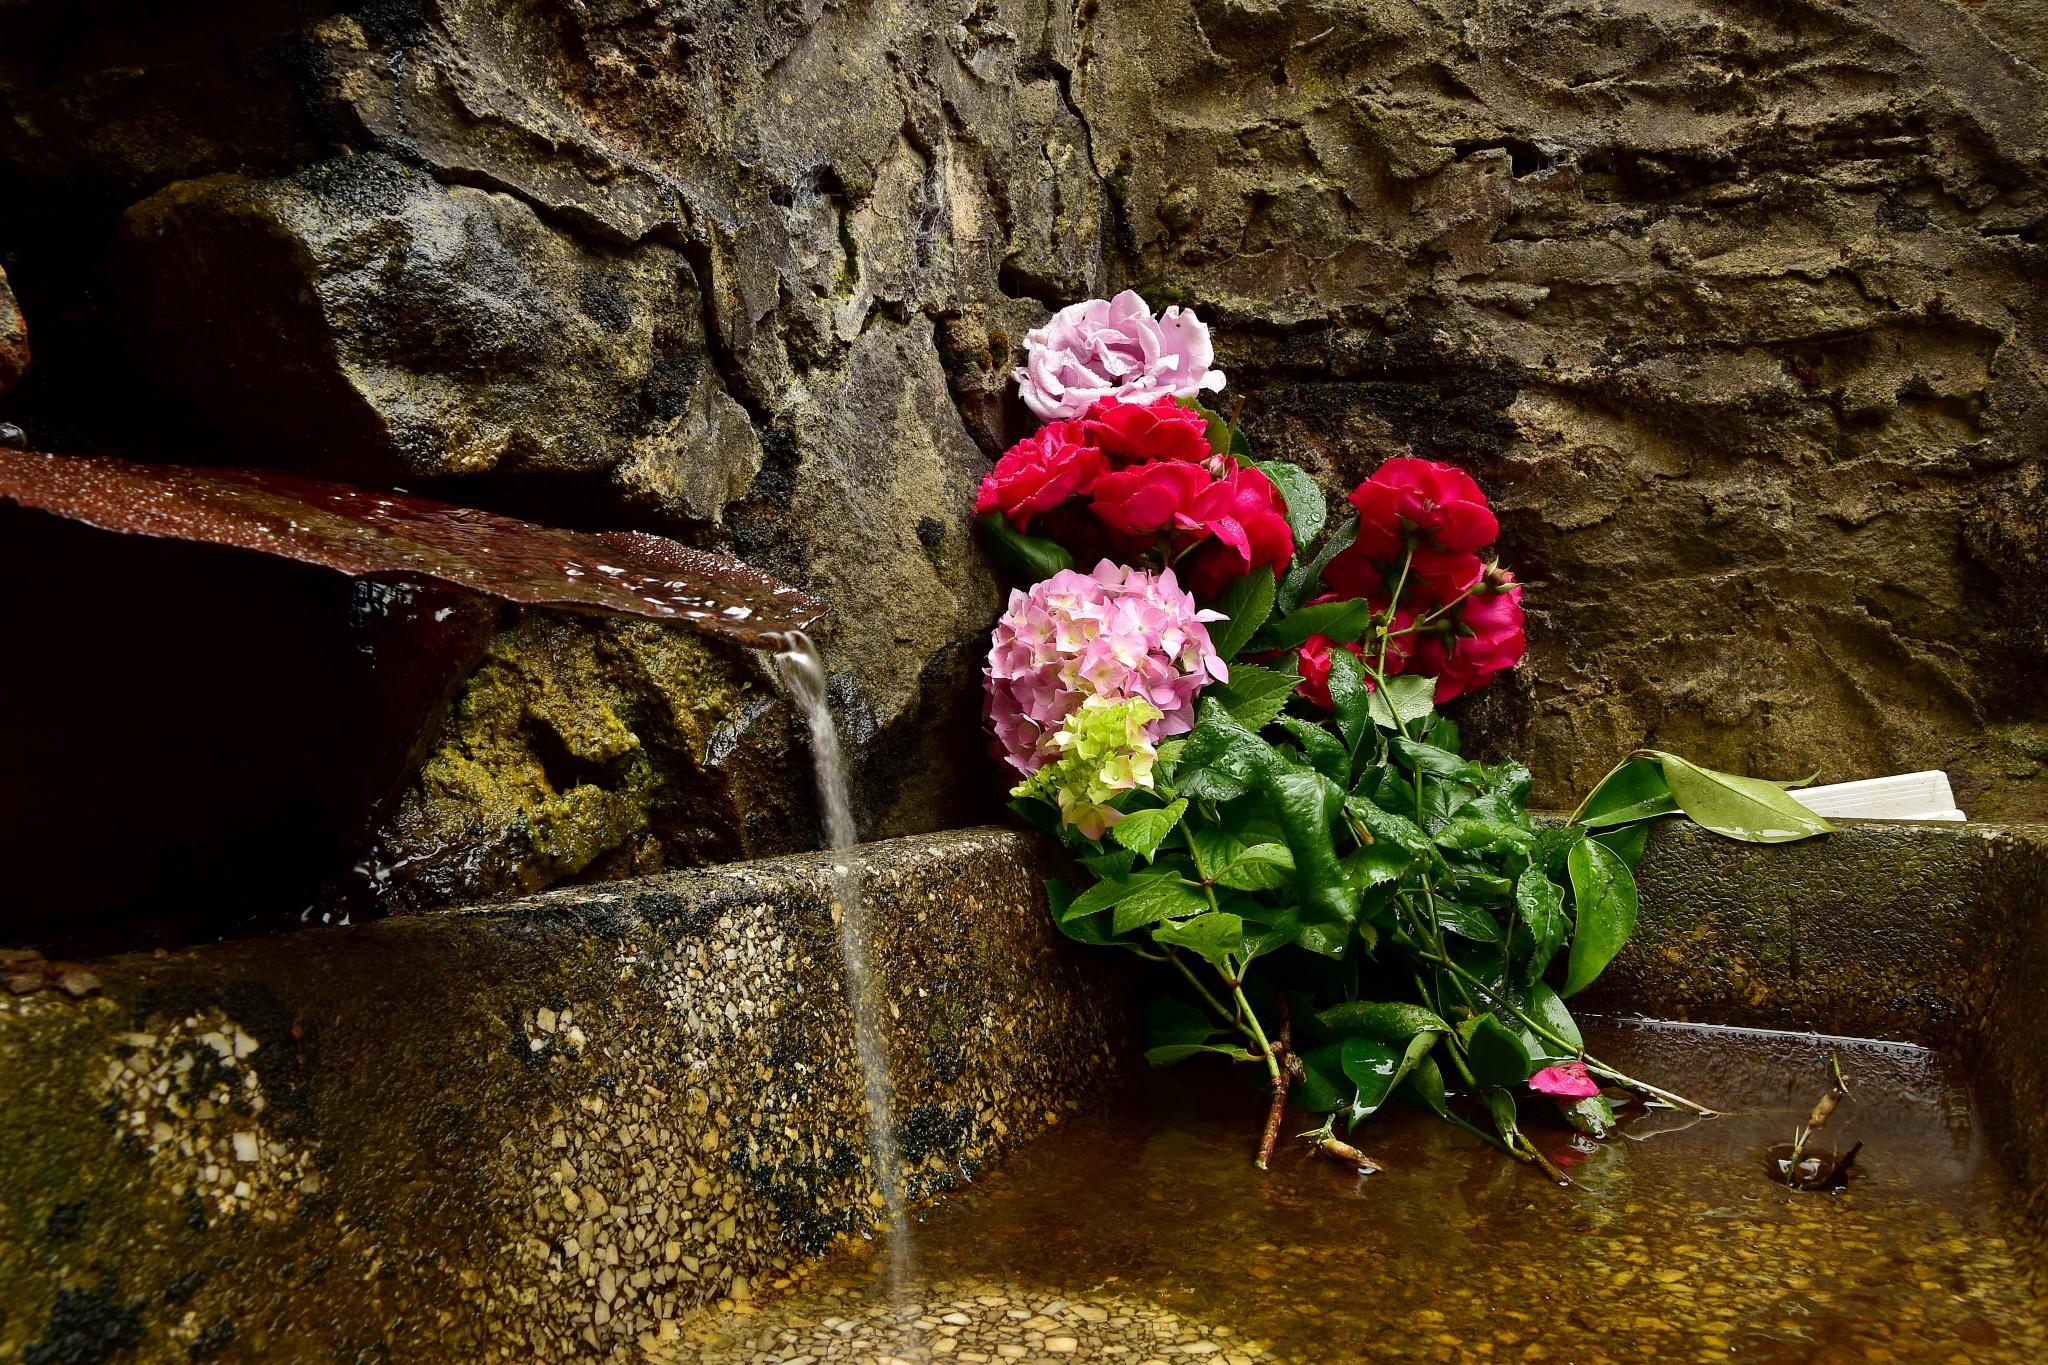 Flowers to the water by Xurde González Uría